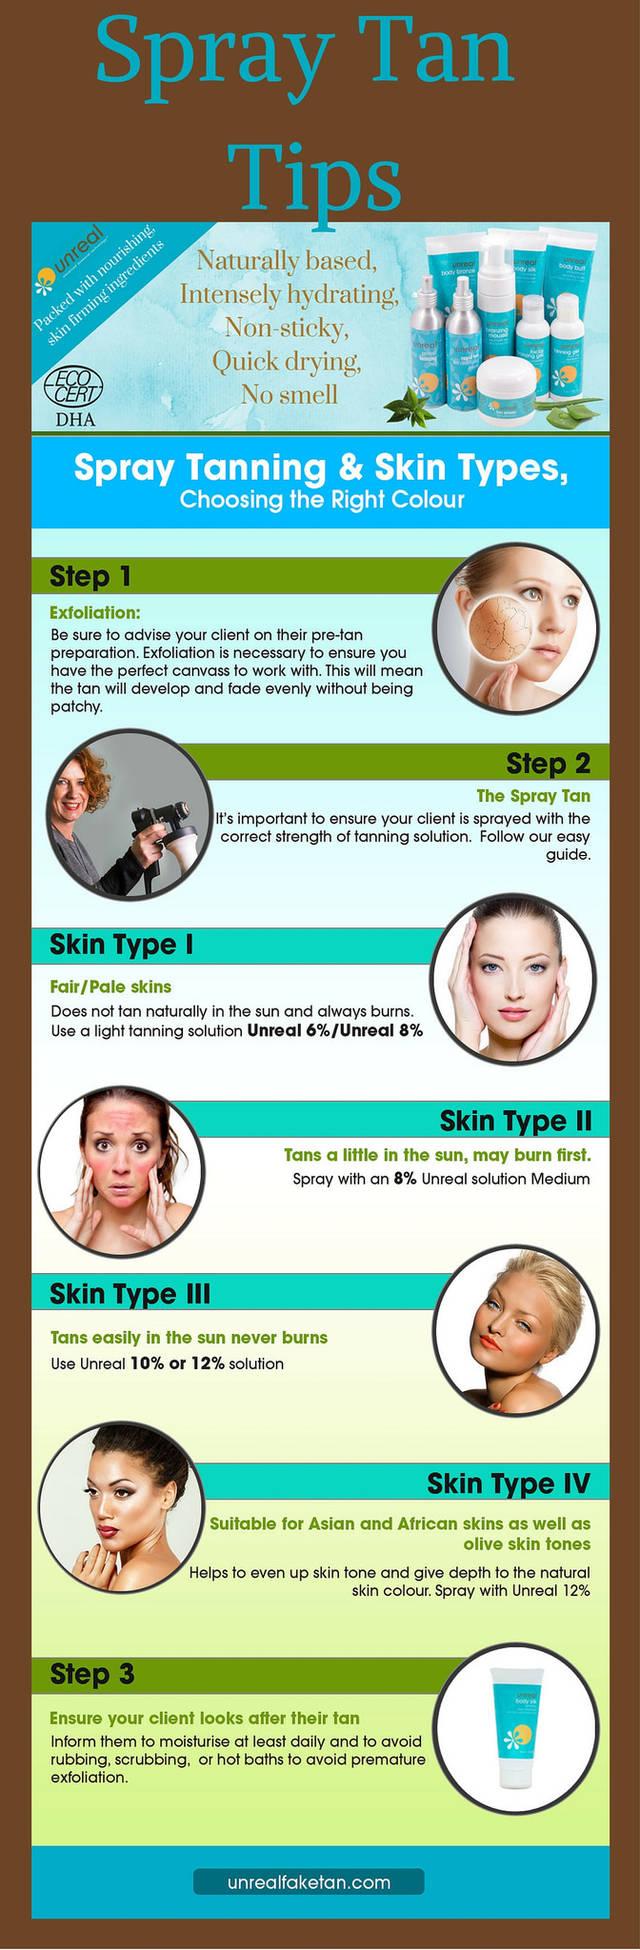 Infographic spray tan tips